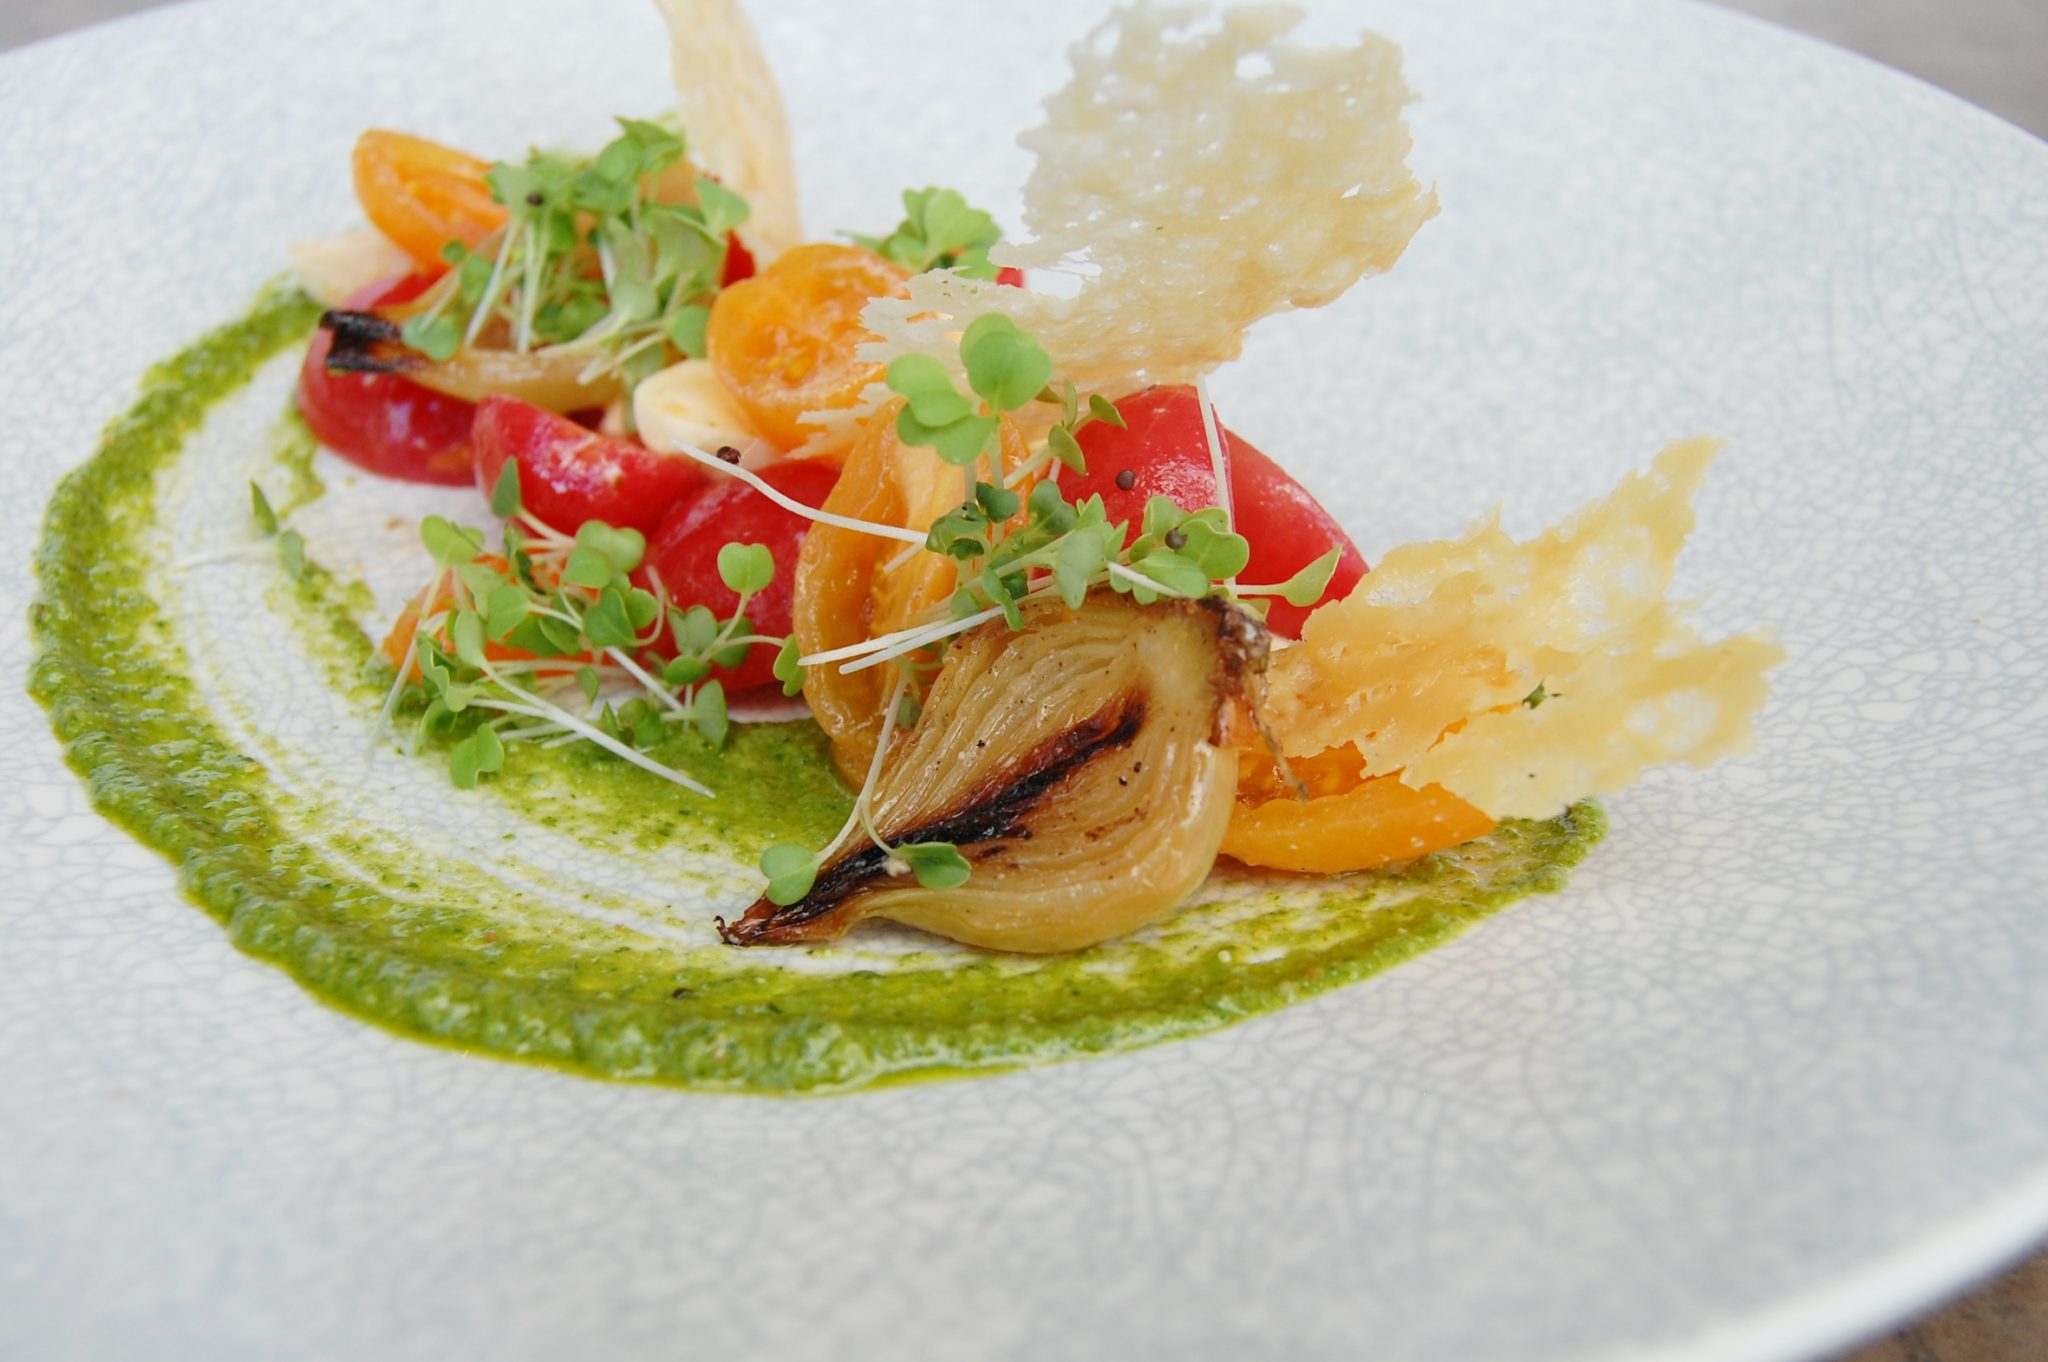 tomato-salad-archie-mclean